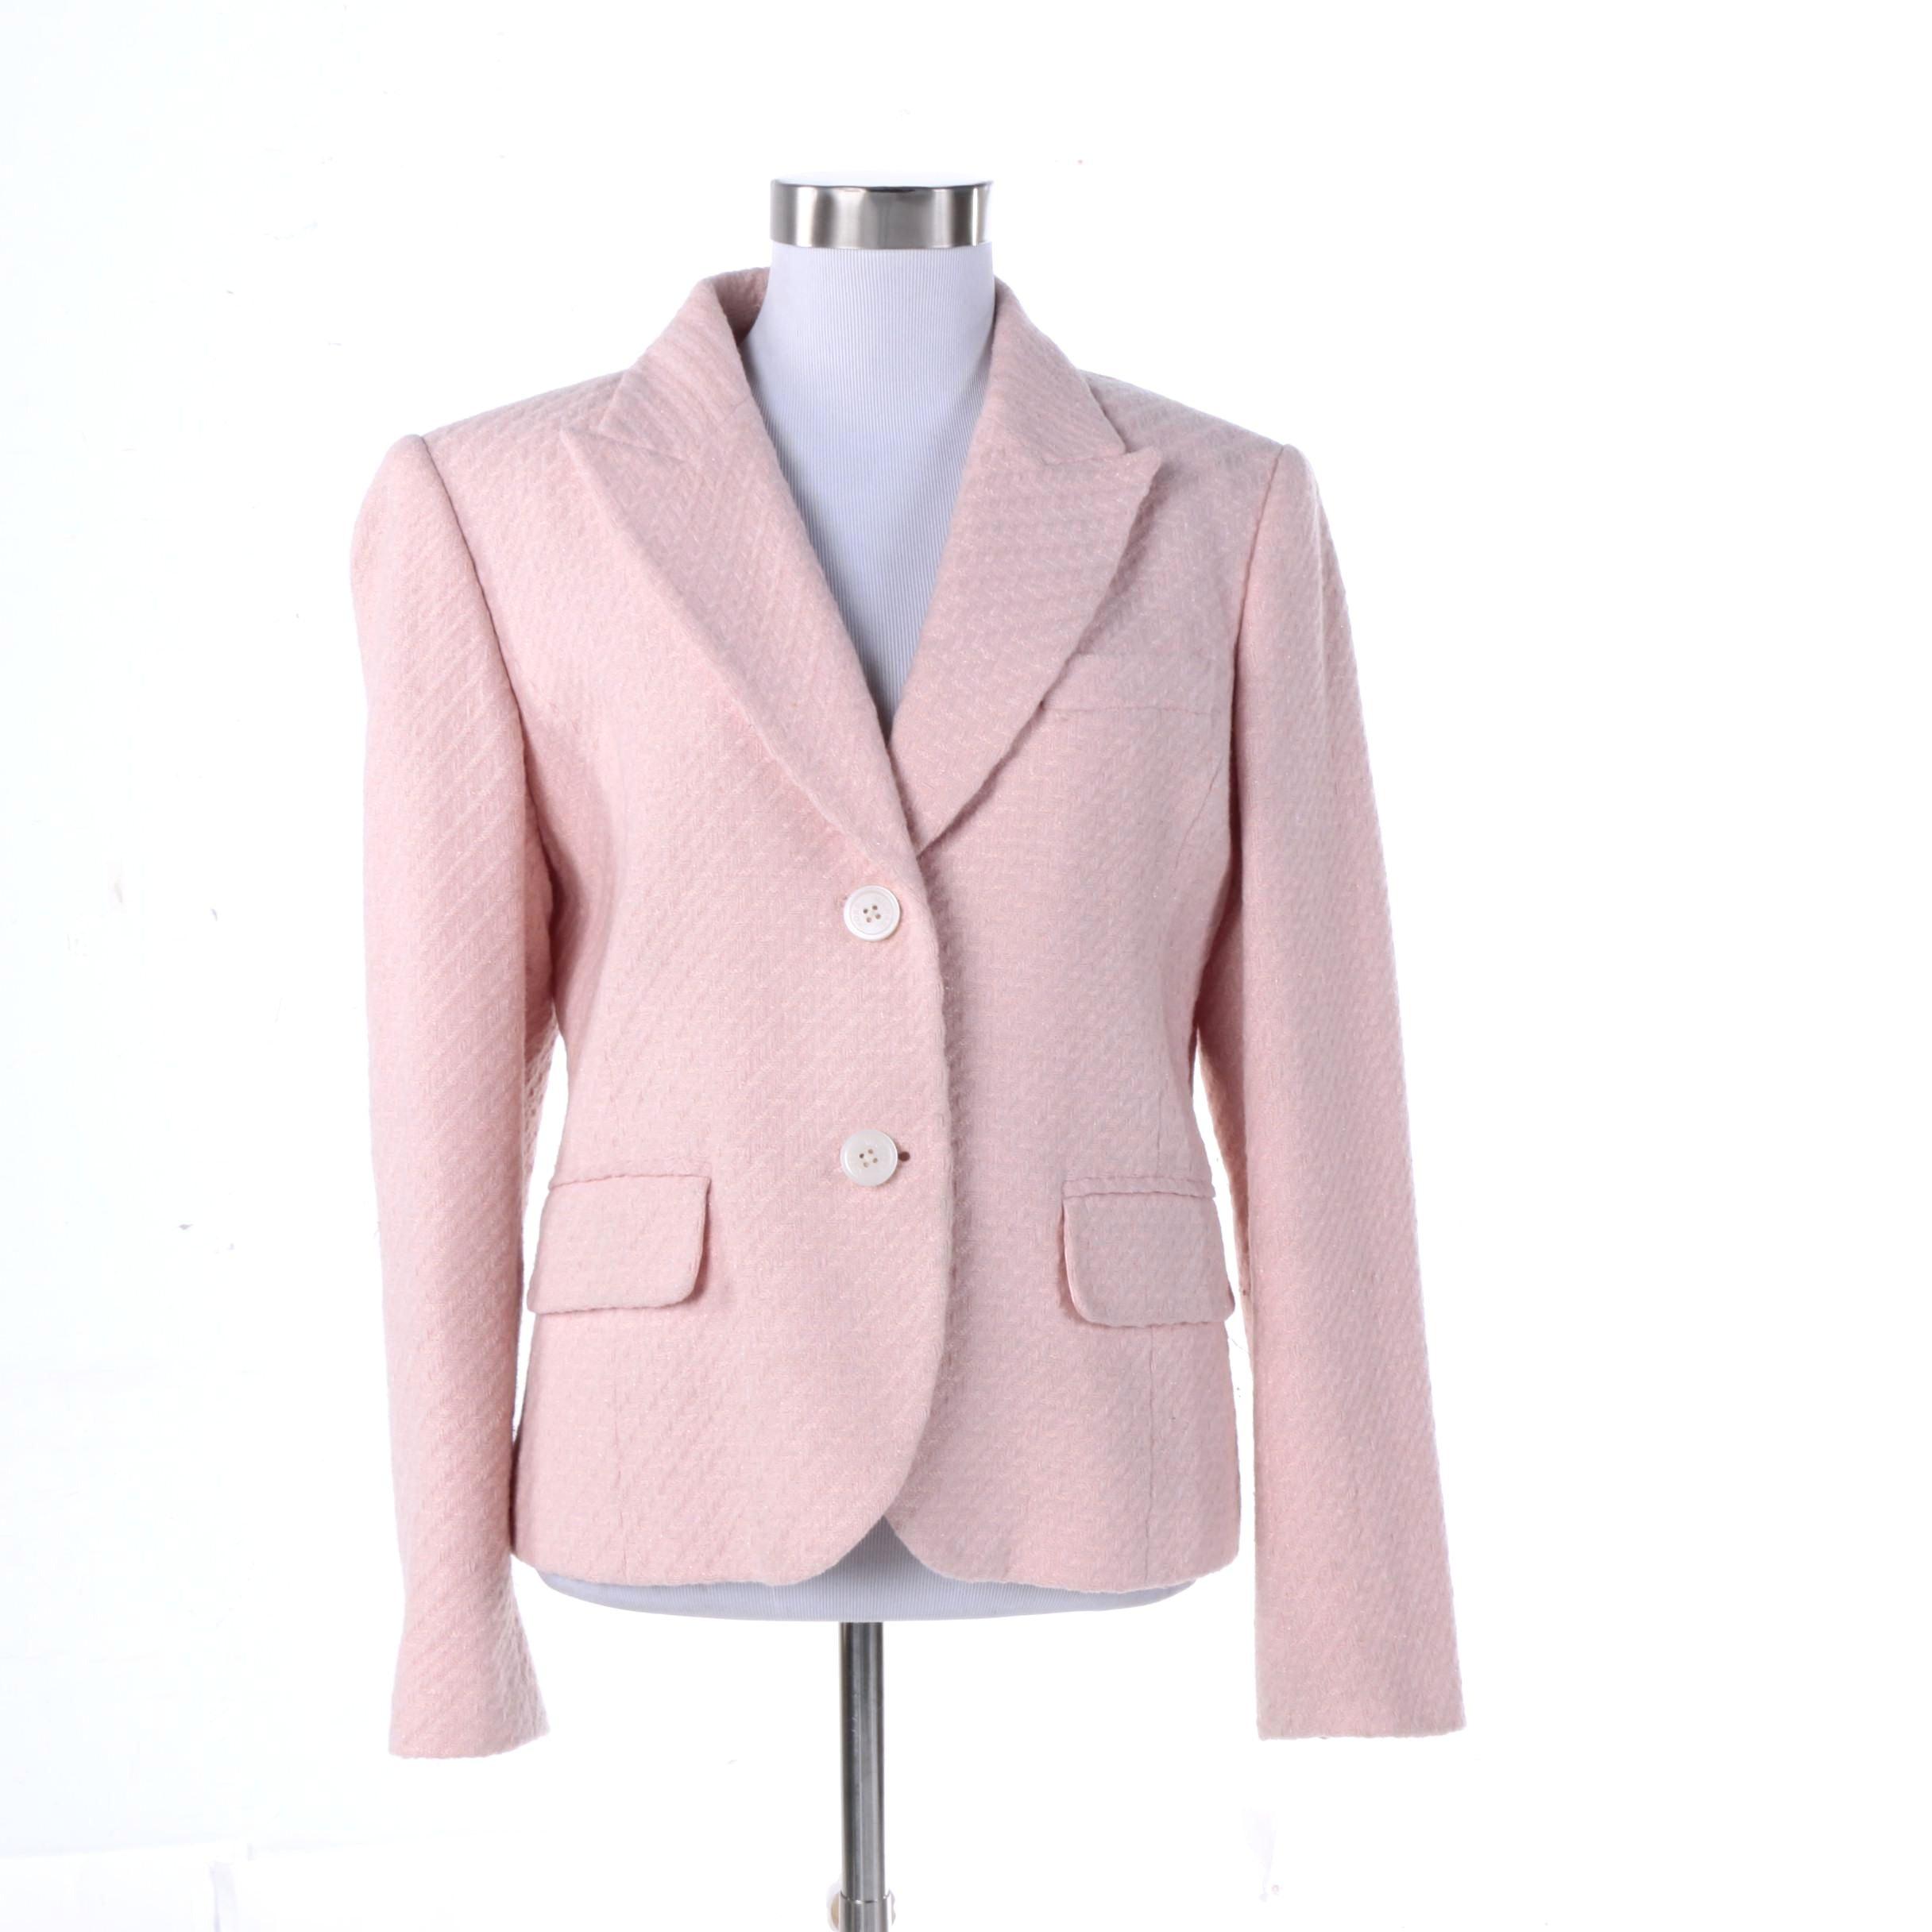 MICHAEL Michael Kors Pink Wool Blend Blazer